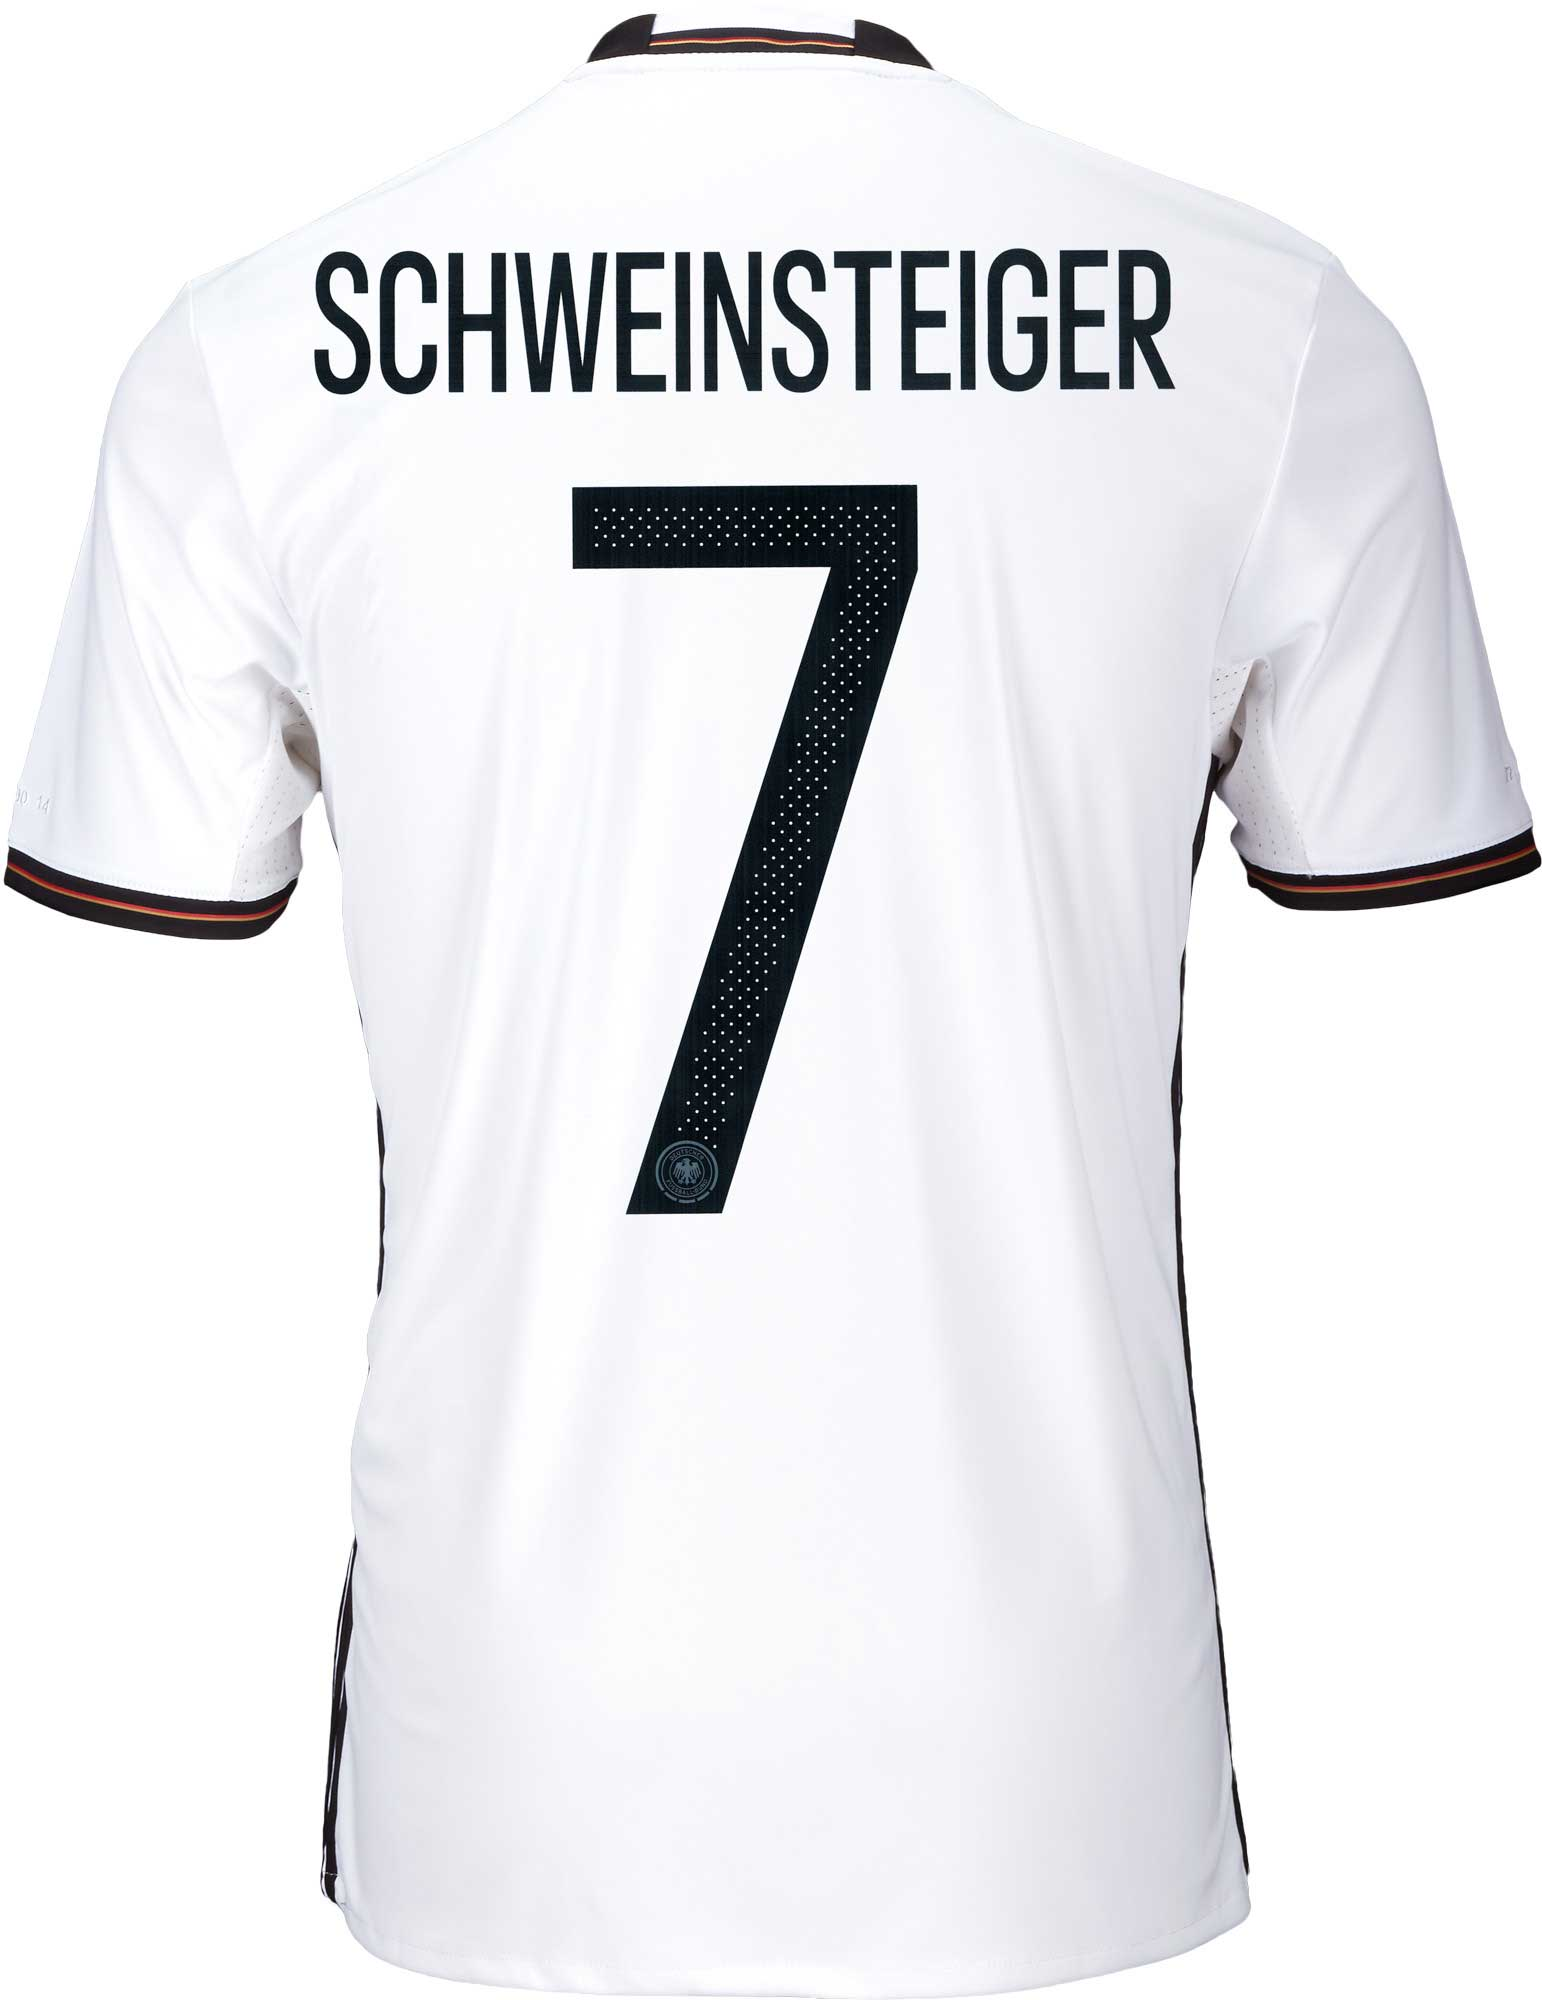 a20722243 adidas Schweinsteiger Germany Home Jersey - 2016 Germany Jerseys